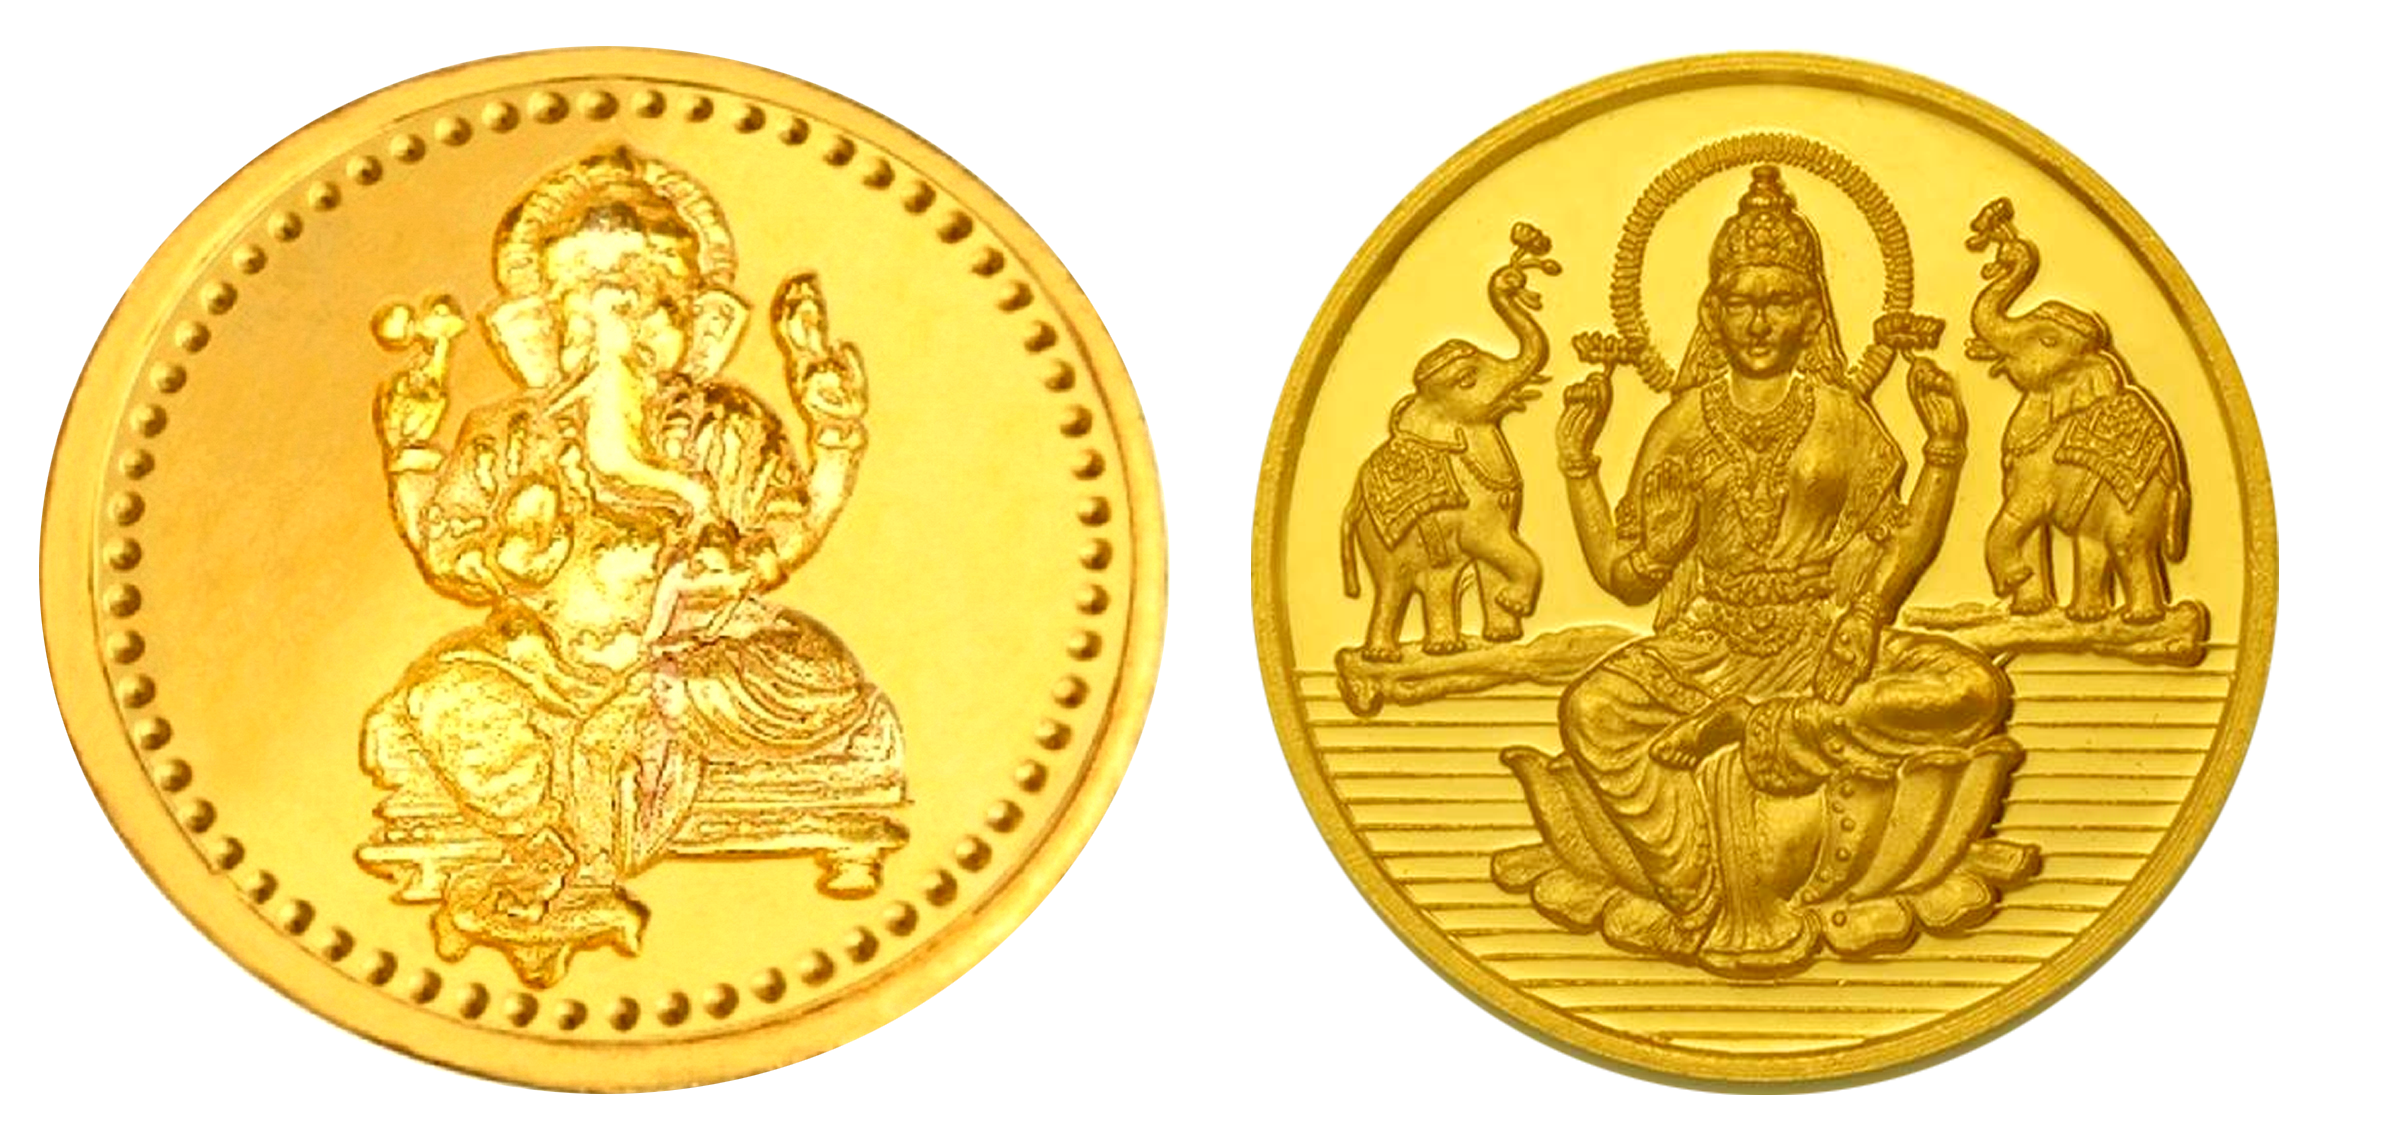 Coin clipart plain gold. Coins png hd transparent